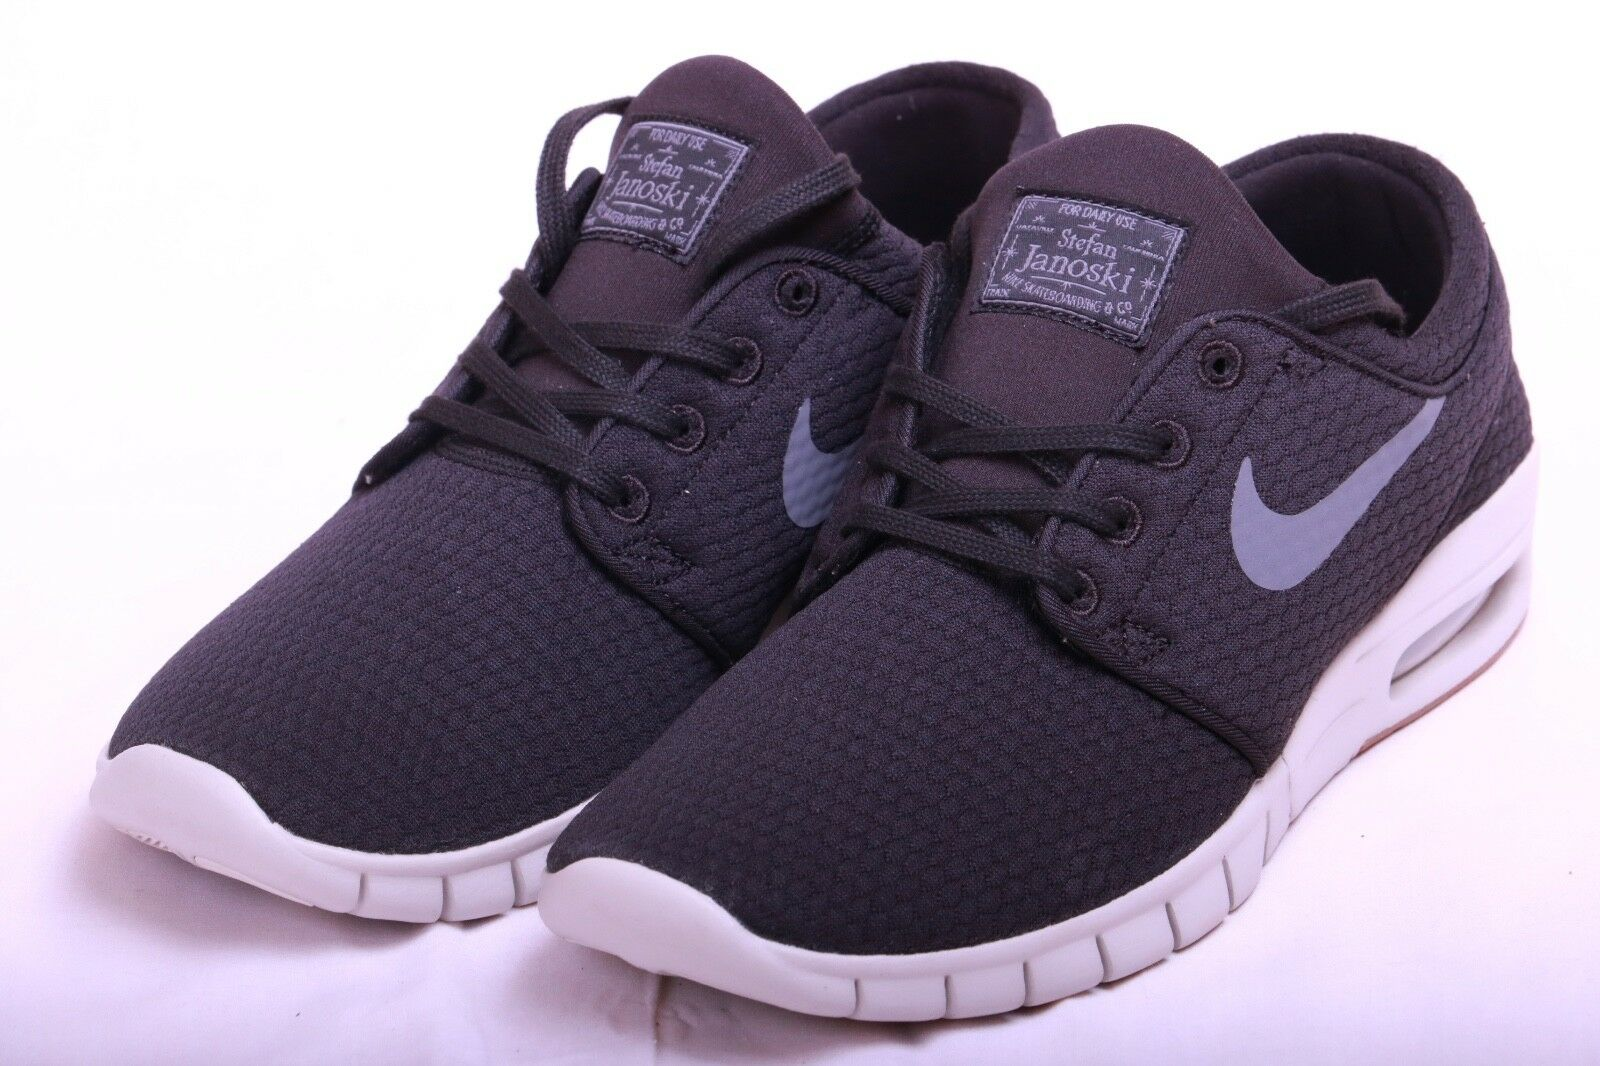 Nike Men's SB Stefan Janoski Max Black Dark Grey Grey Grey 631303 020 Size 9.5 705e82